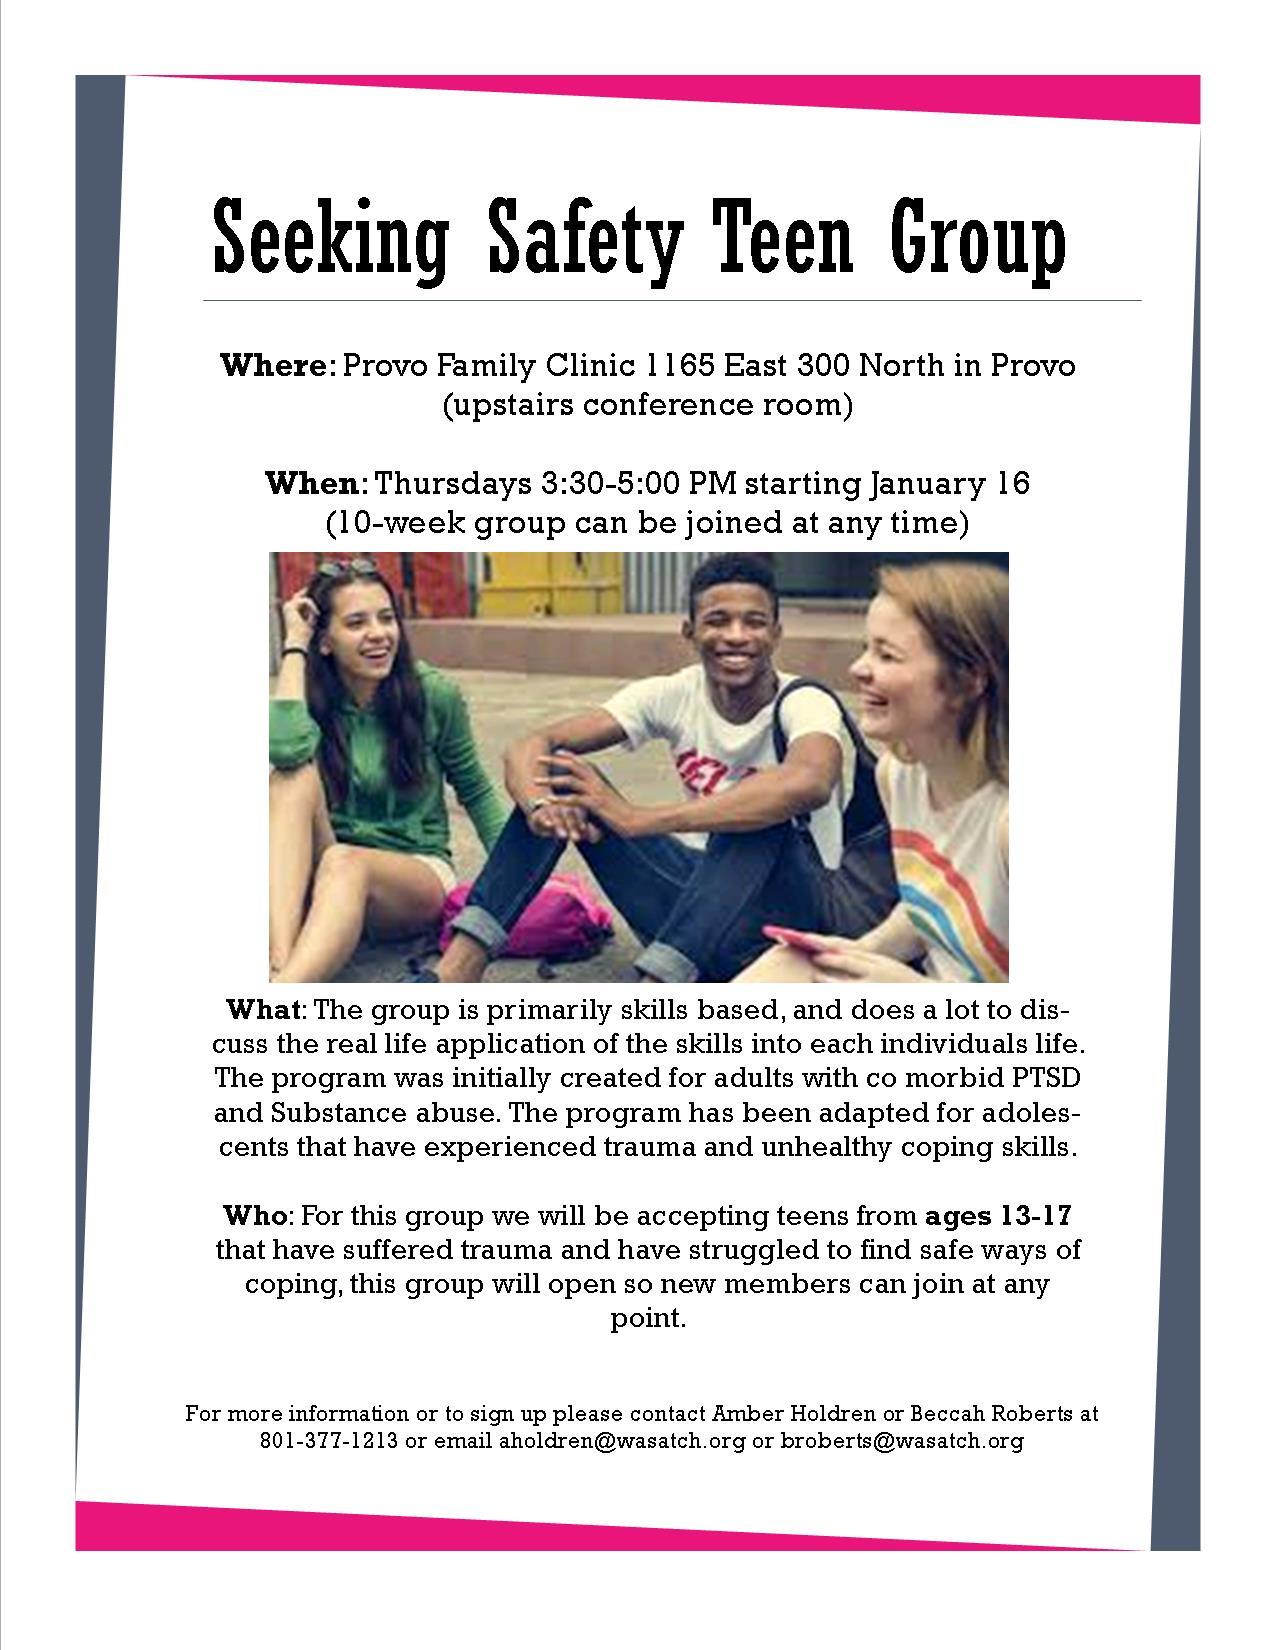 Seeking Safety Teen Group flyer